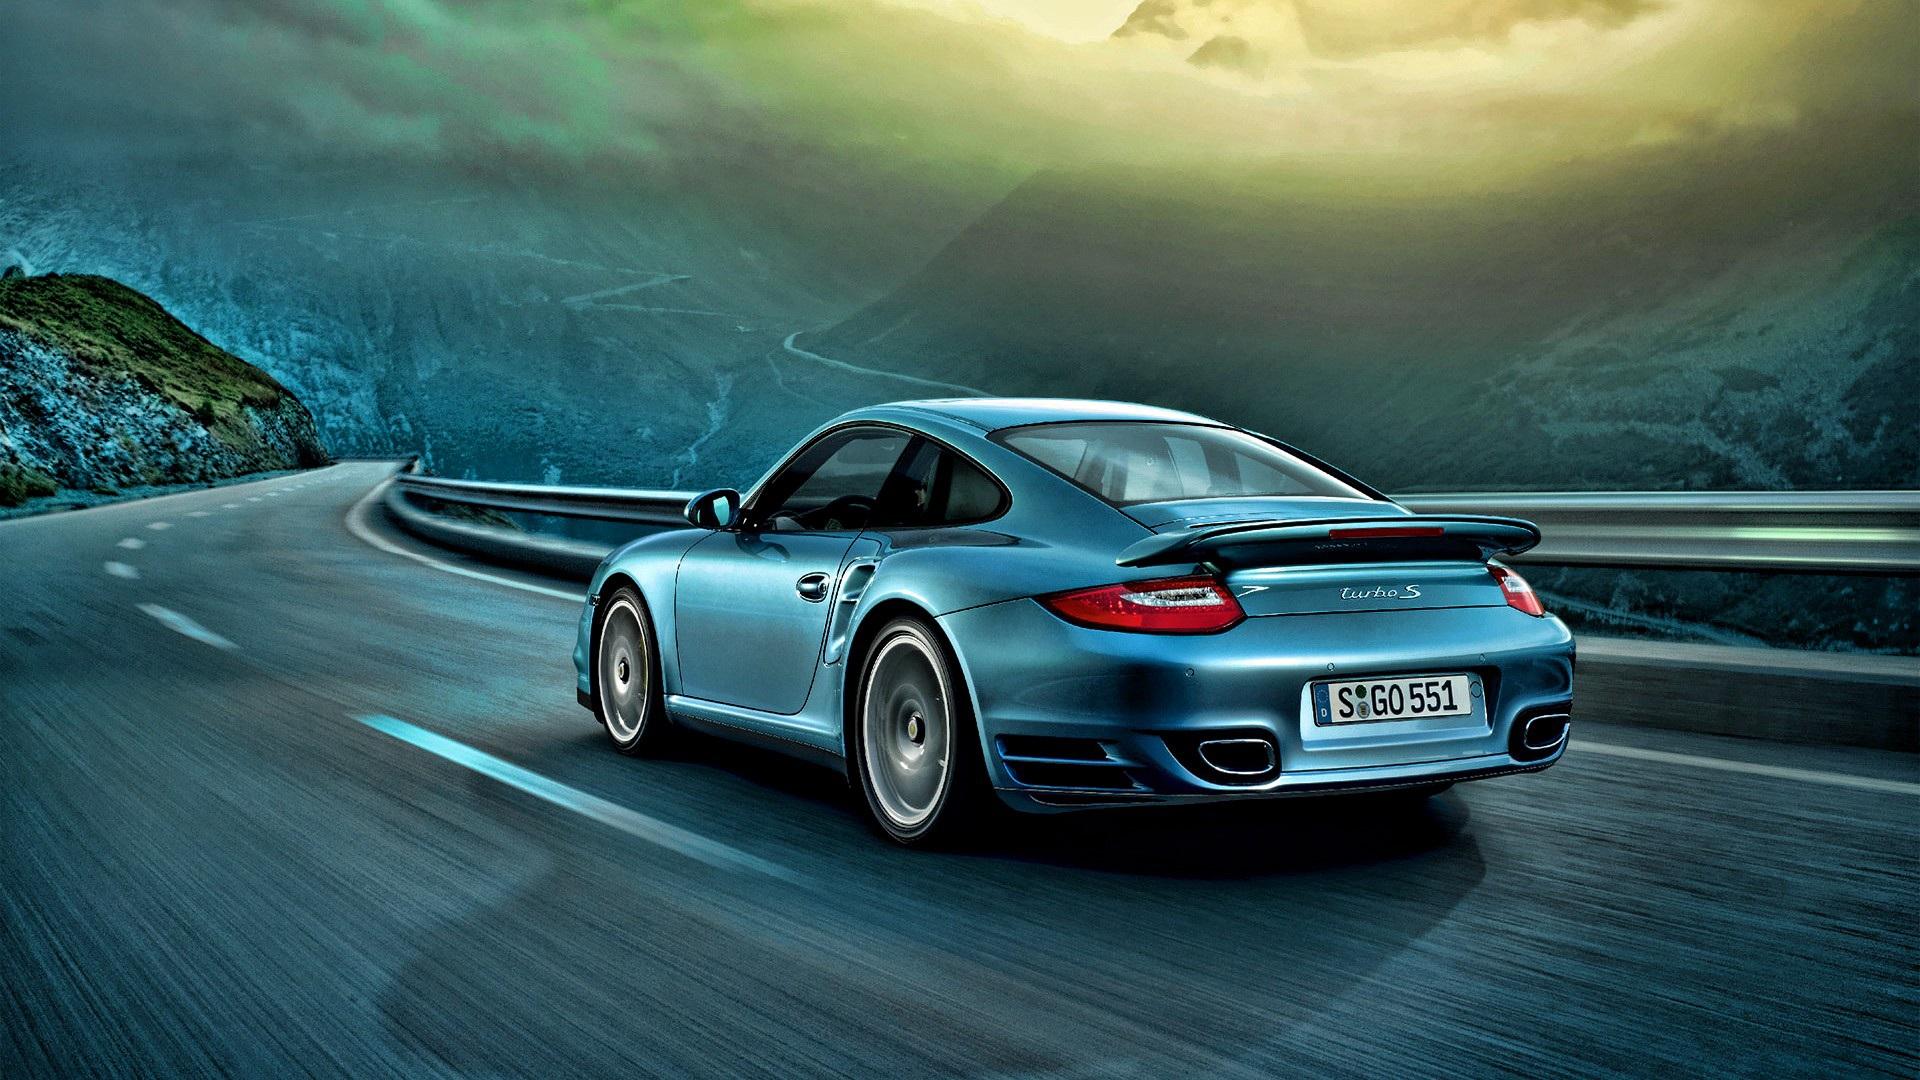 Porsche 911 Turbo   wallpaper 1920x1080